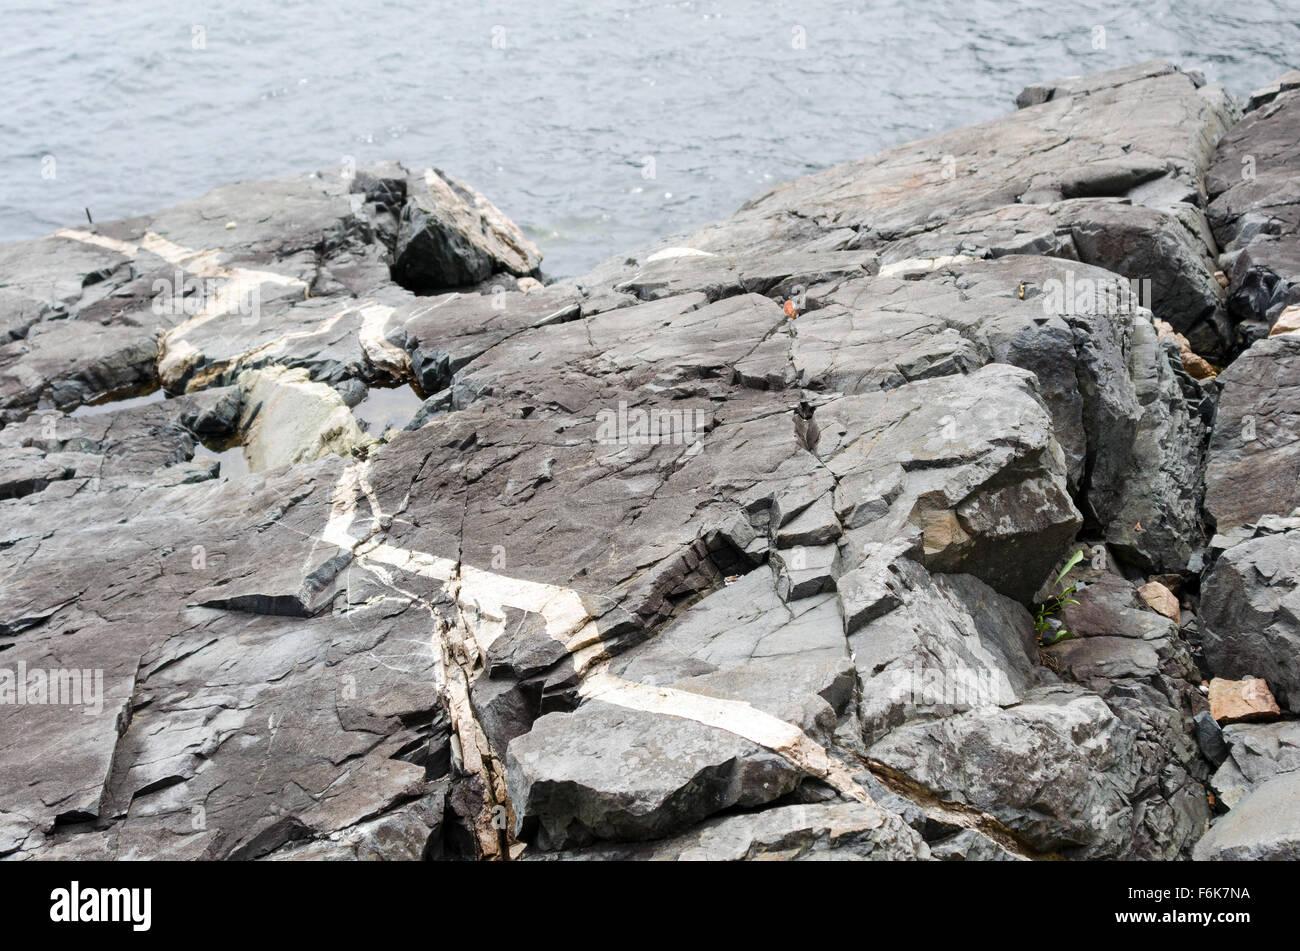 A thick quartz intrusion runs through coastal outcroppings of Ellsworth Schist on Mount Desert Island, Maine. - Stock Image